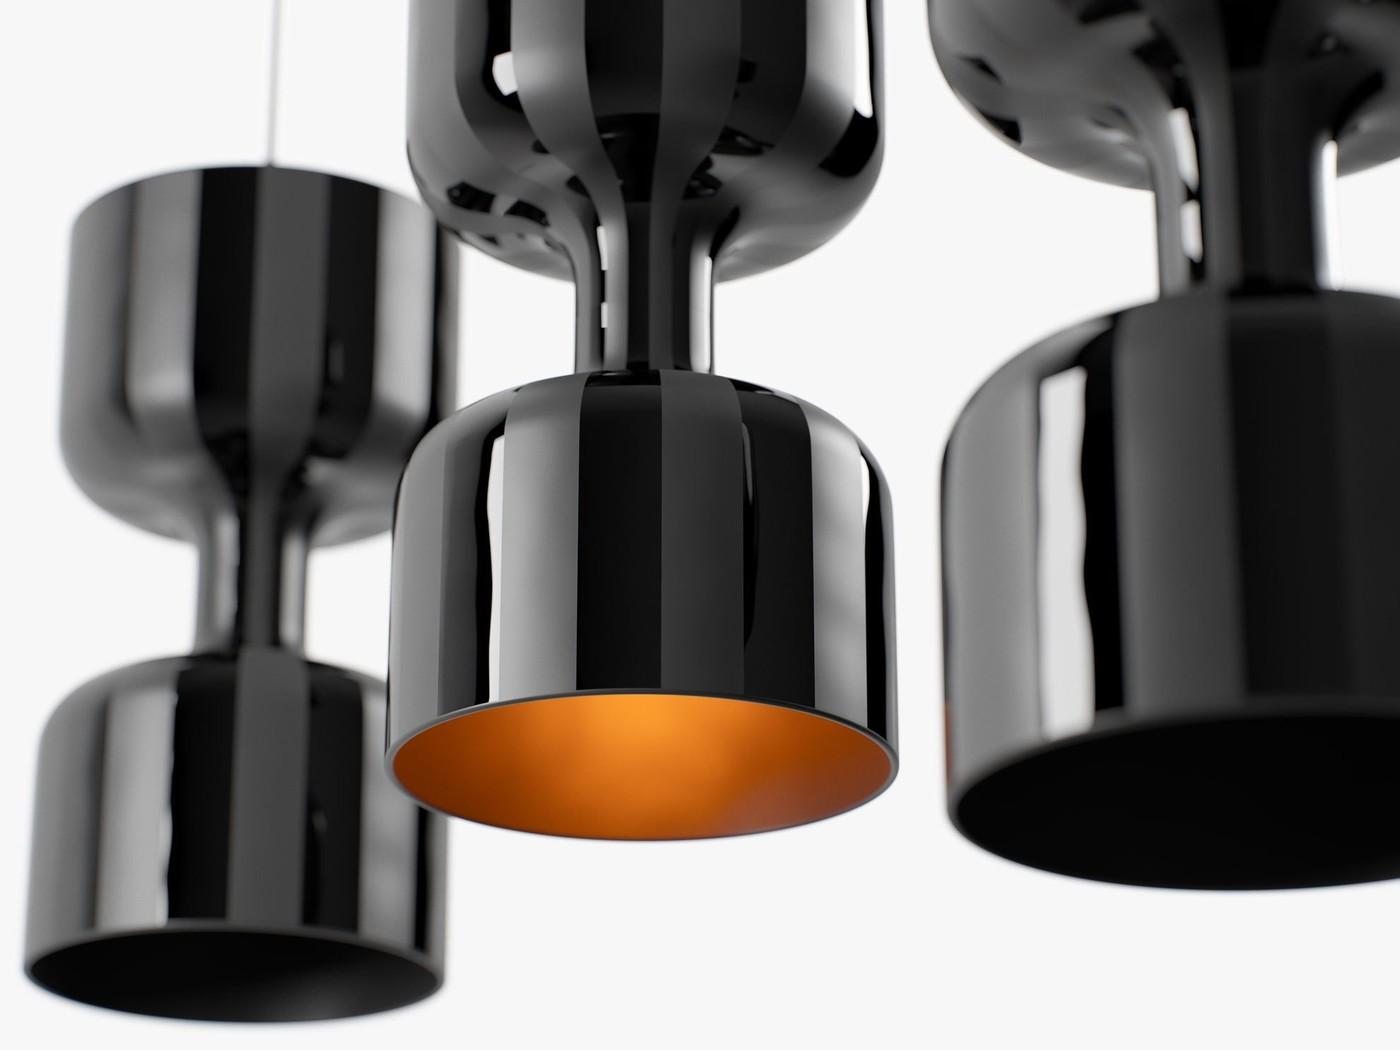 Modern Pendant Lamps Made in Italy - Chapiteau Porsche by Ekaterina Elizarova